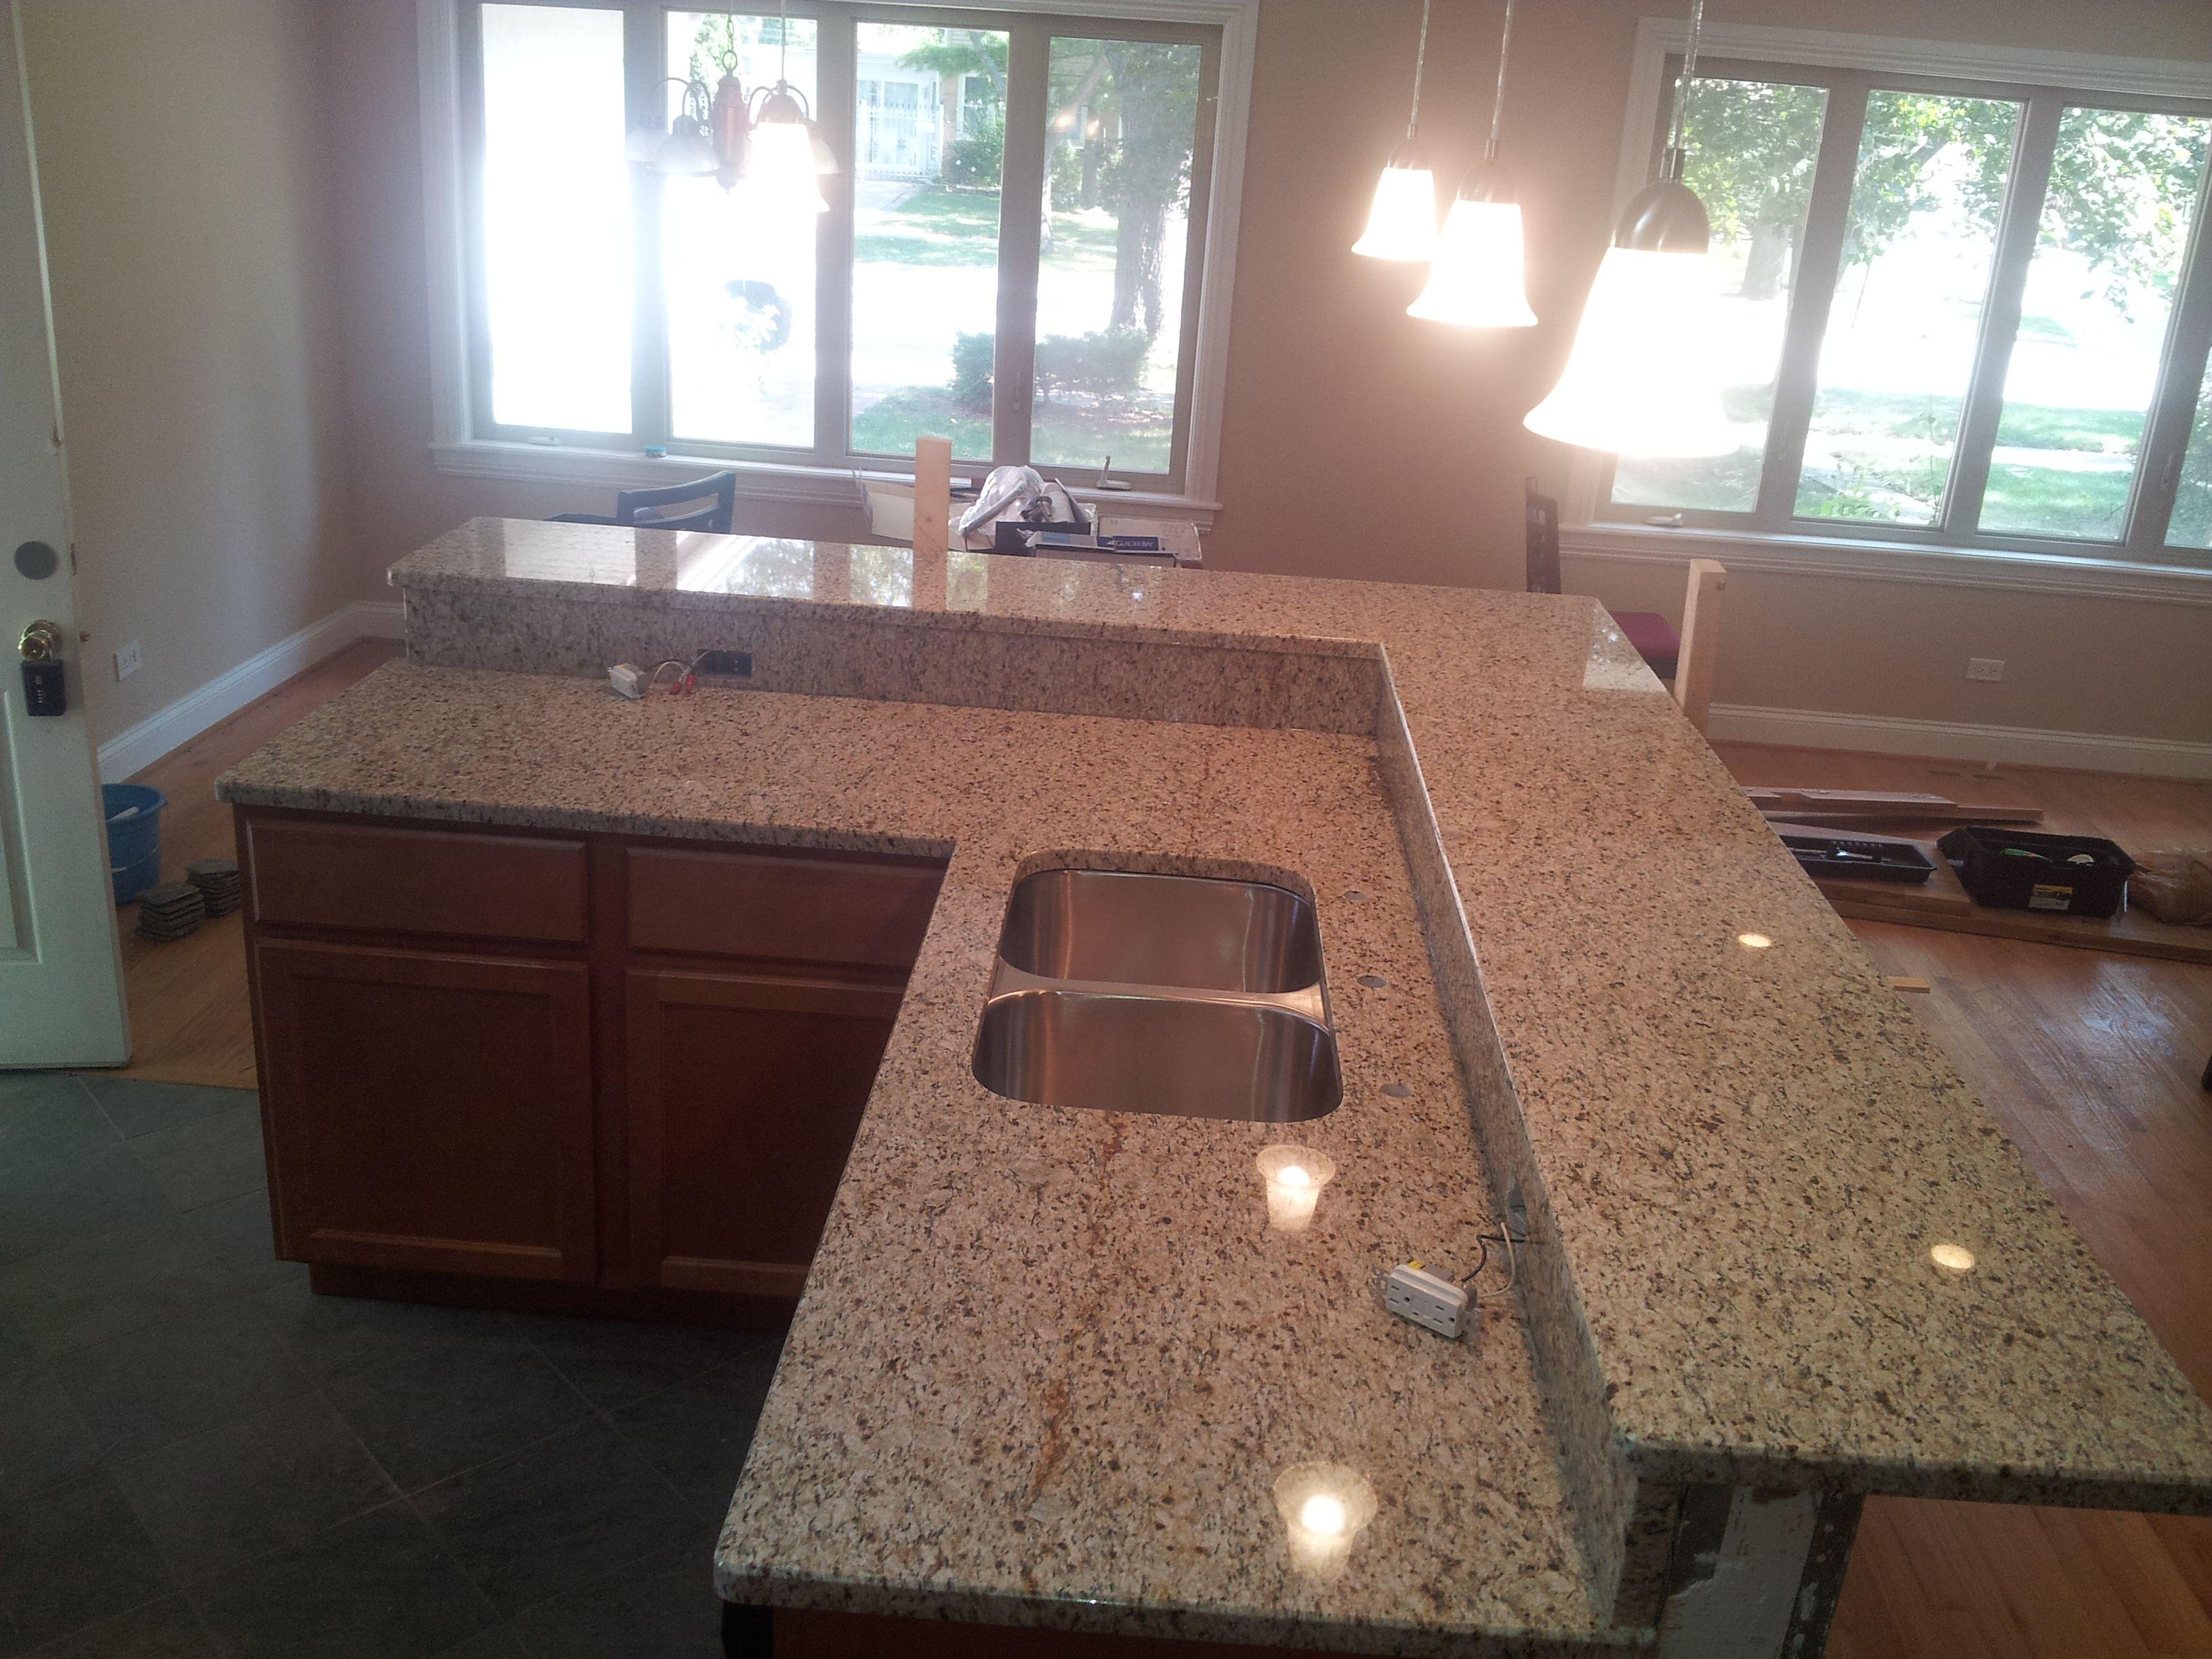 Art Granite Countertops Inc 1020 Lunt Ave Unit F Schaumburg Il 60193 Tel 847 923 1323 Fax 847 810 0399 E Granite Countertops Countertops Mini Bar